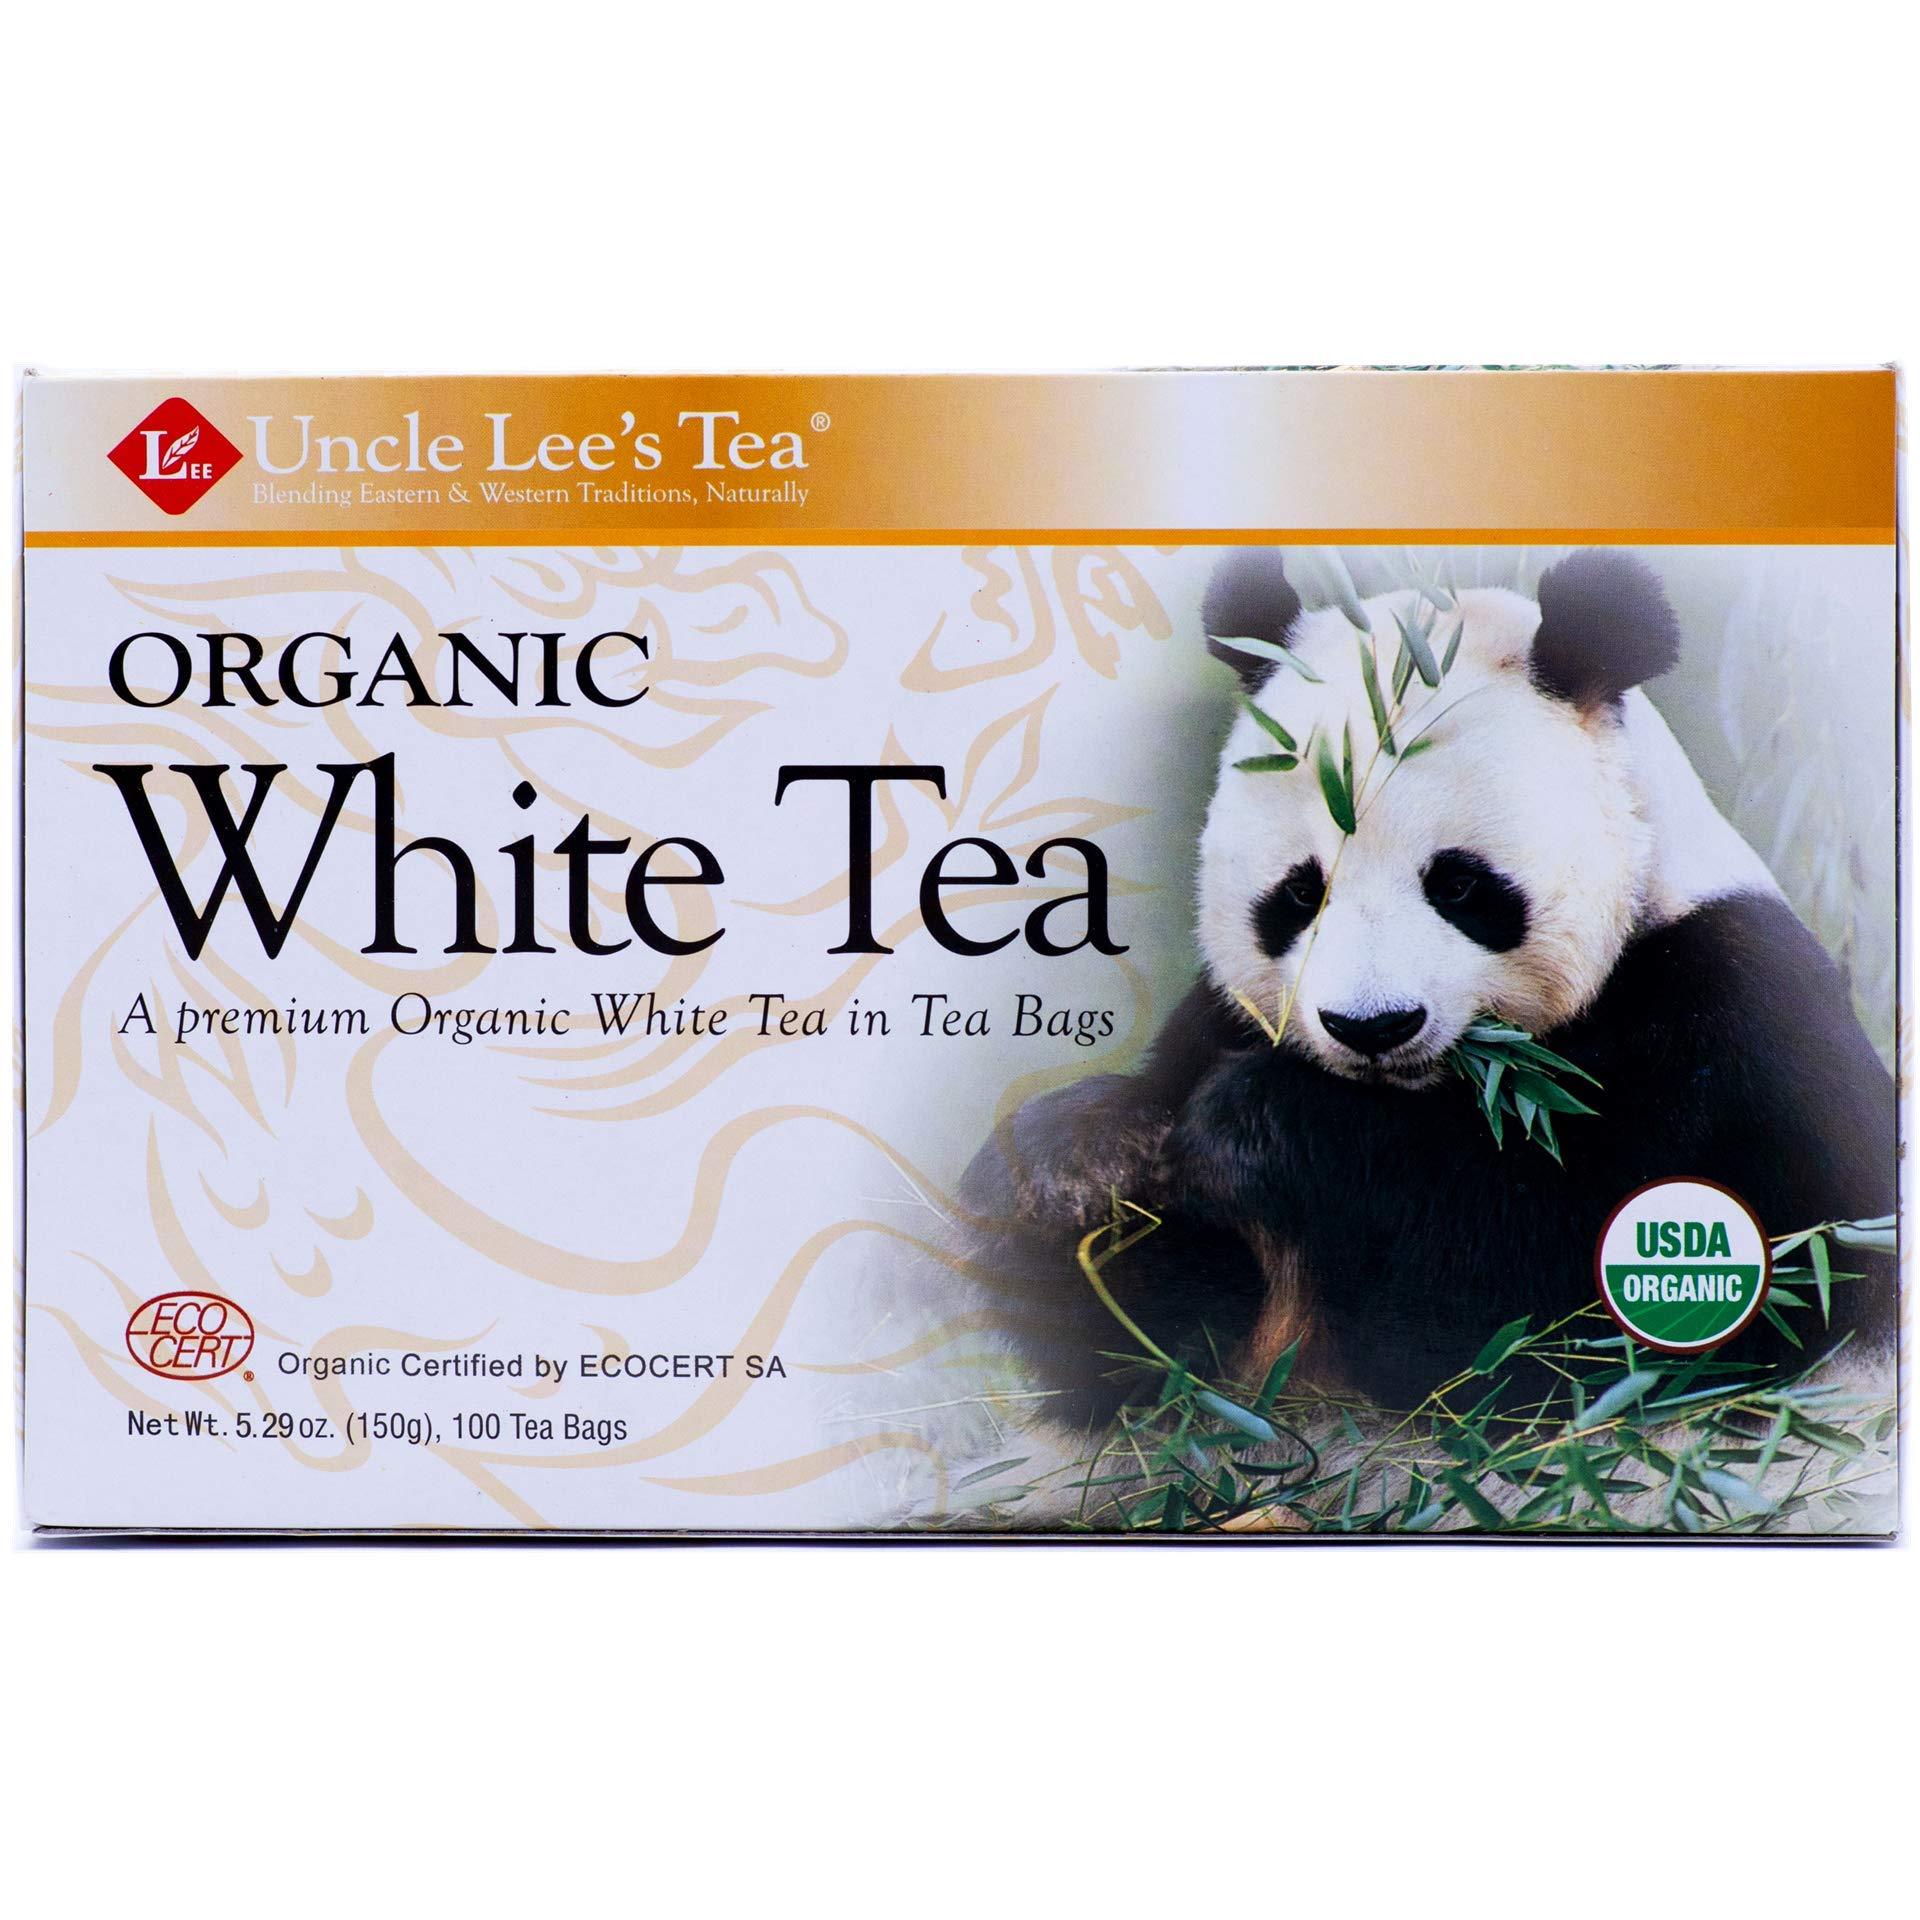 Uncle Lee's Tea Organic White Tea, Tea Bags, 100-Count Boxes (Pack of 4) by Uncle Lee's Tea